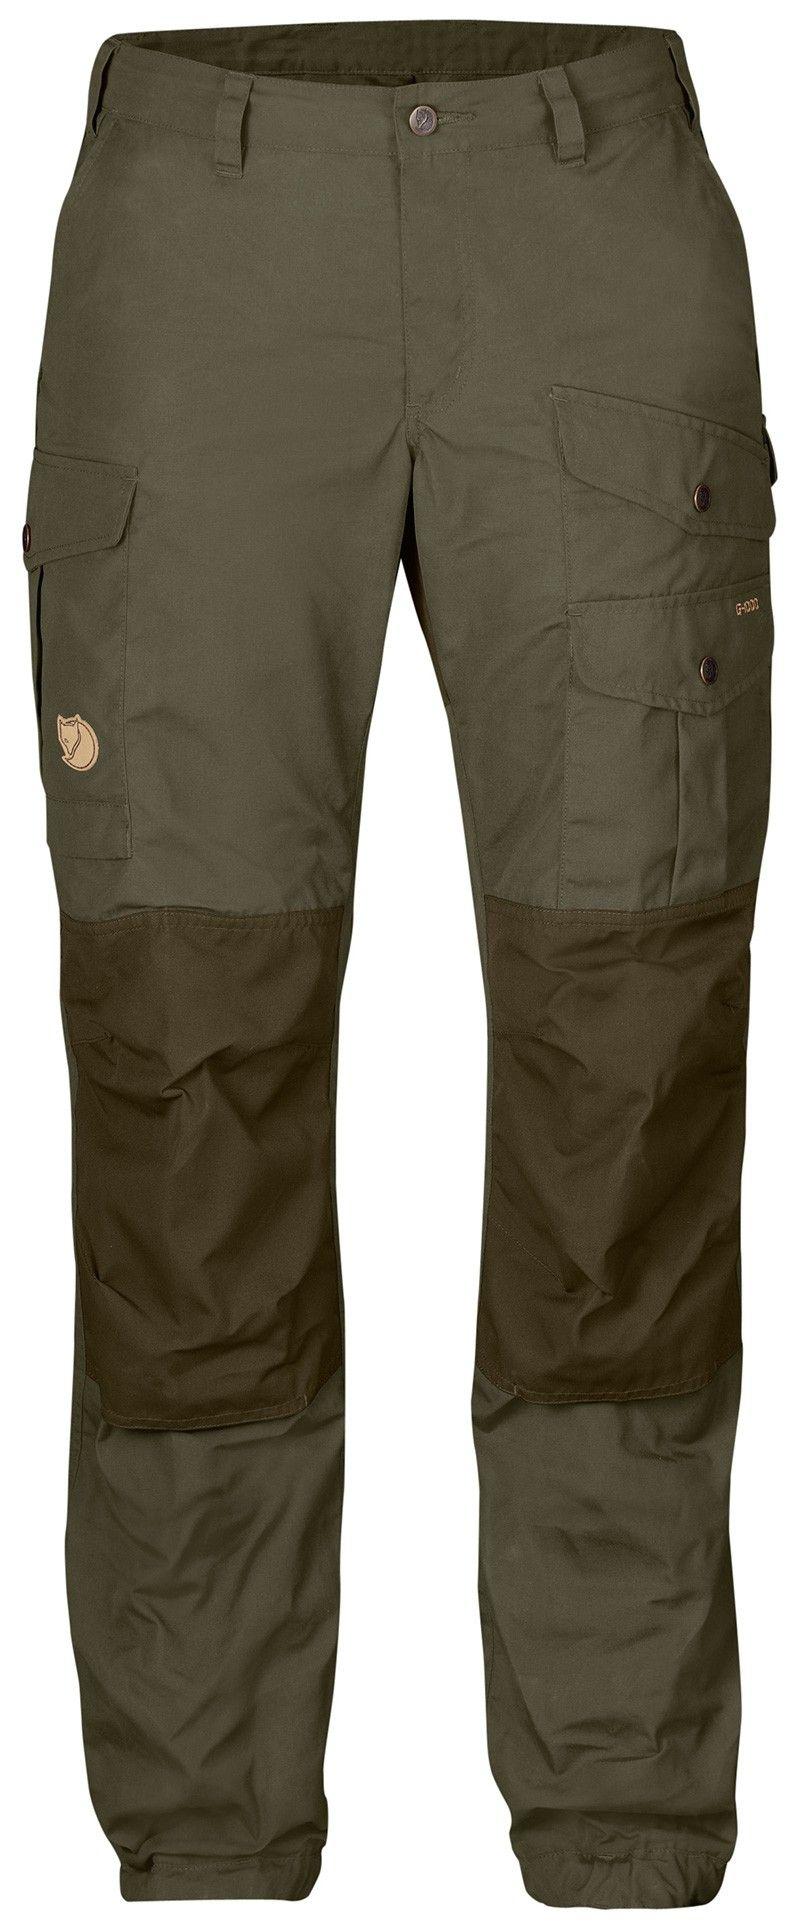 Vidda Pro Trousers W Regular Trousers Pants Hiking Pants